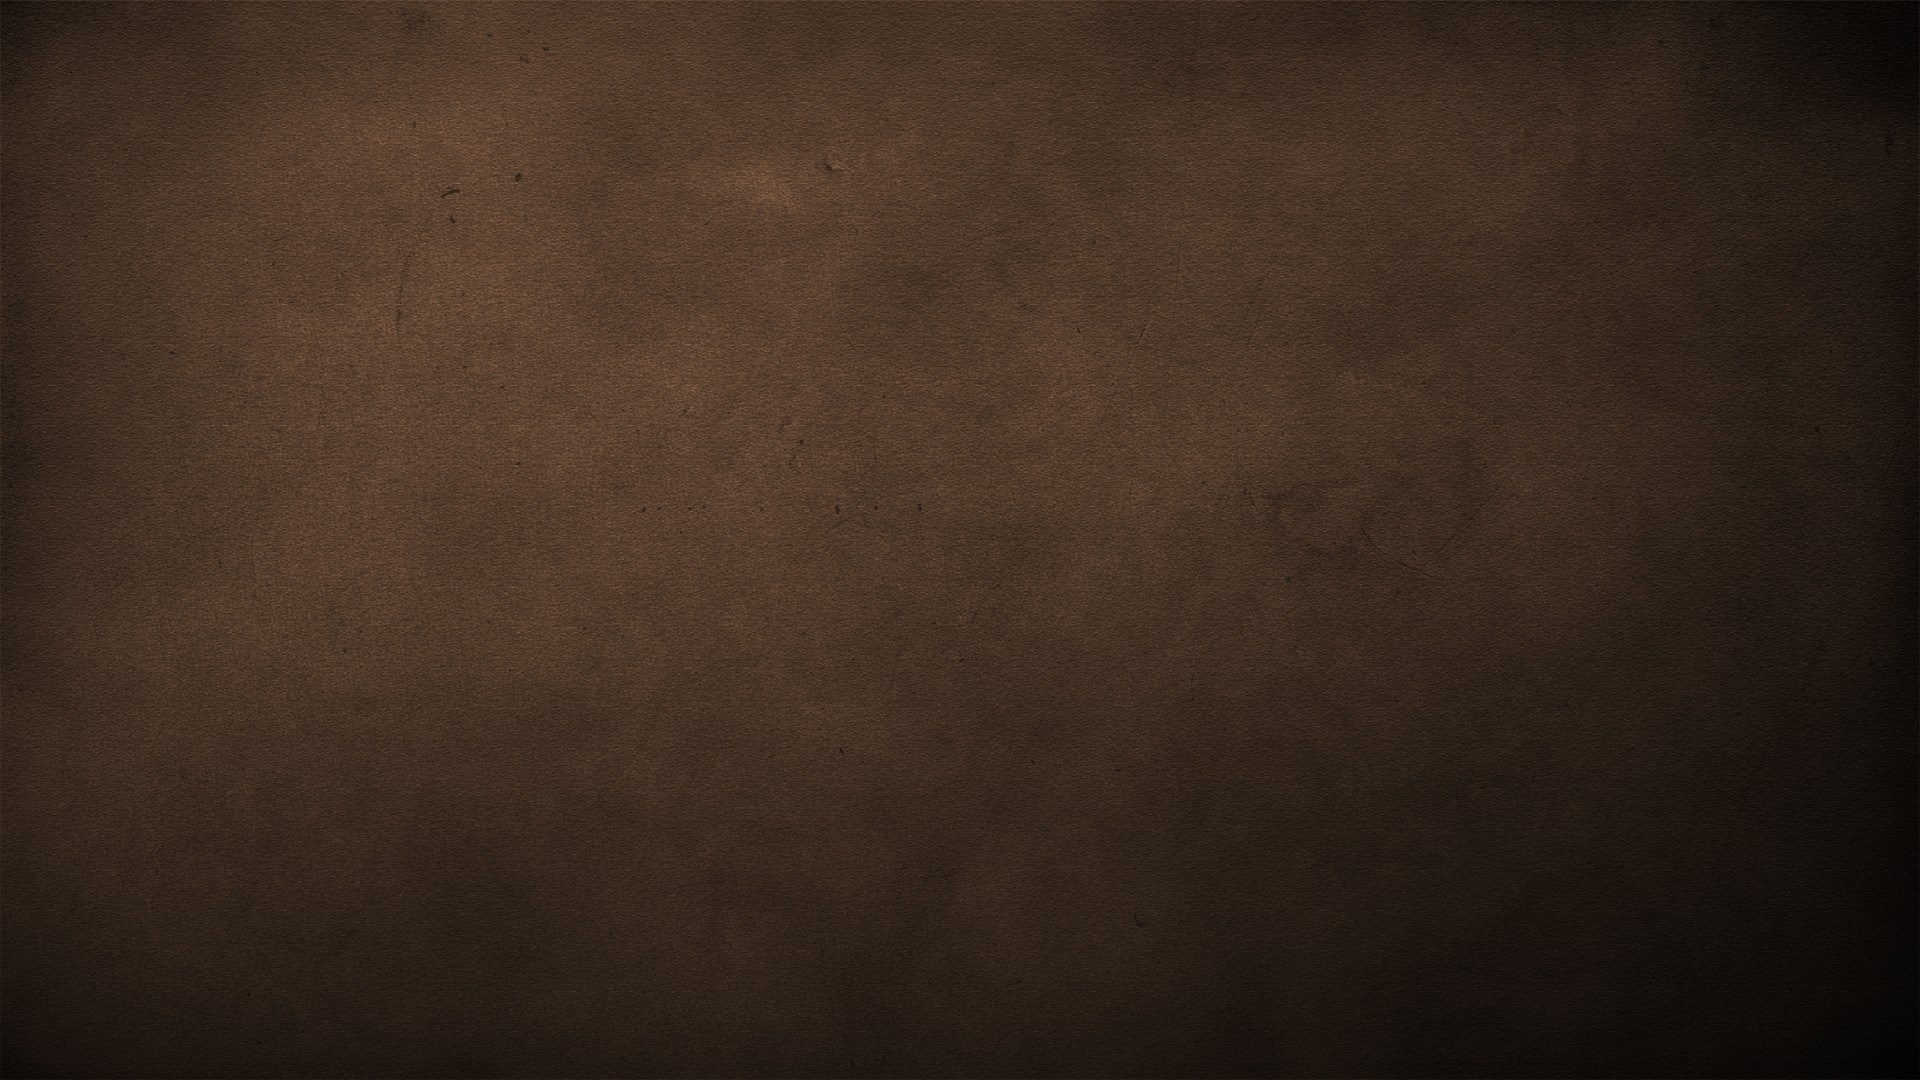 Brown Wallpaper 1920x1080 Minimalistic Brown Textures Background 1920x1080